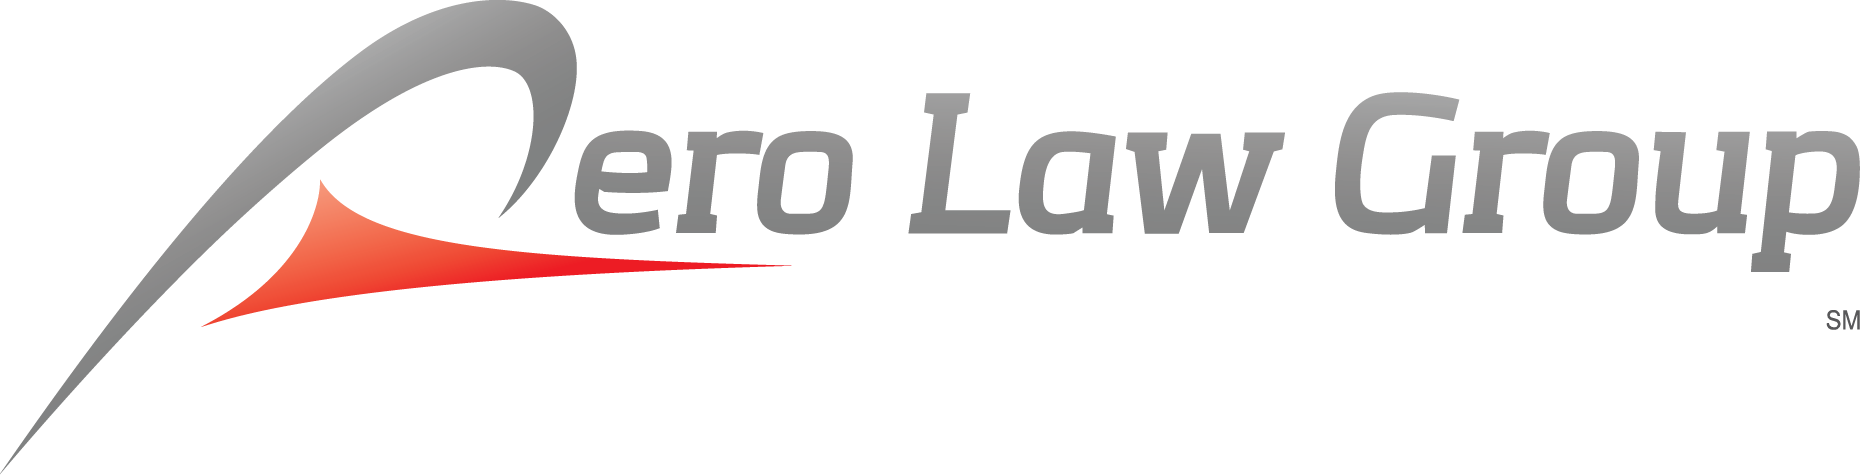 Aero Law Group logo